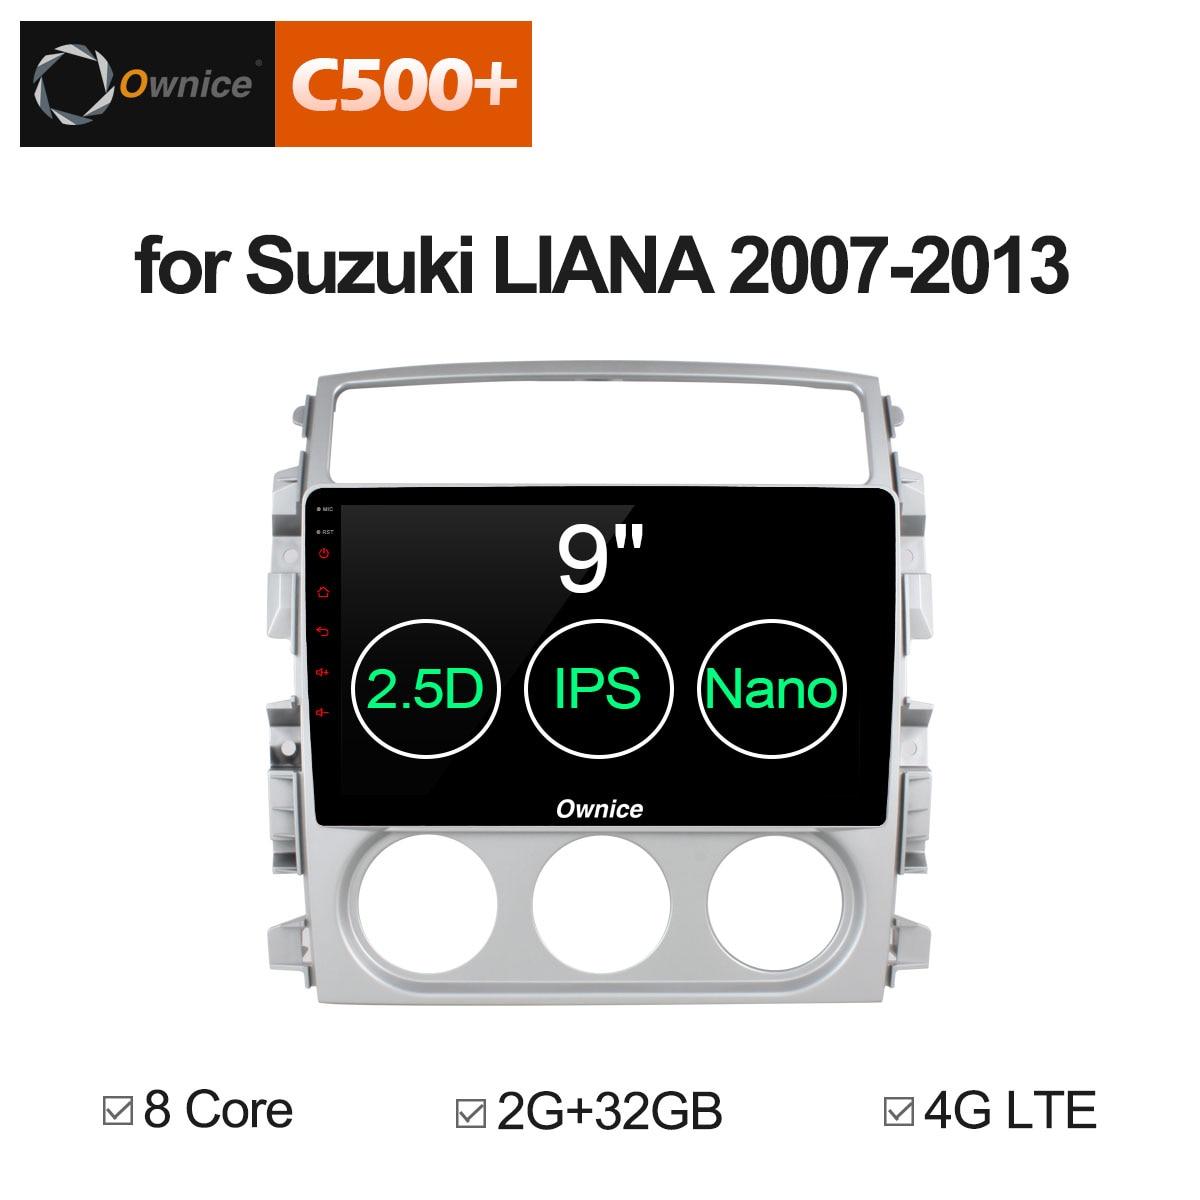 Ownice C500+ G10 8 Core 2G+32G Android 8.1 Car DVD GPS for Suzuki Liana 2007 - 2013 Autoradio Radio GPS Support 4G SIM Car Play ownice c500 4g sim lte octa 8 core android 6 0 for kia ceed 2013 2015 car dvd player gps navi radio wifi 4g bt 2gb ram 32g rom